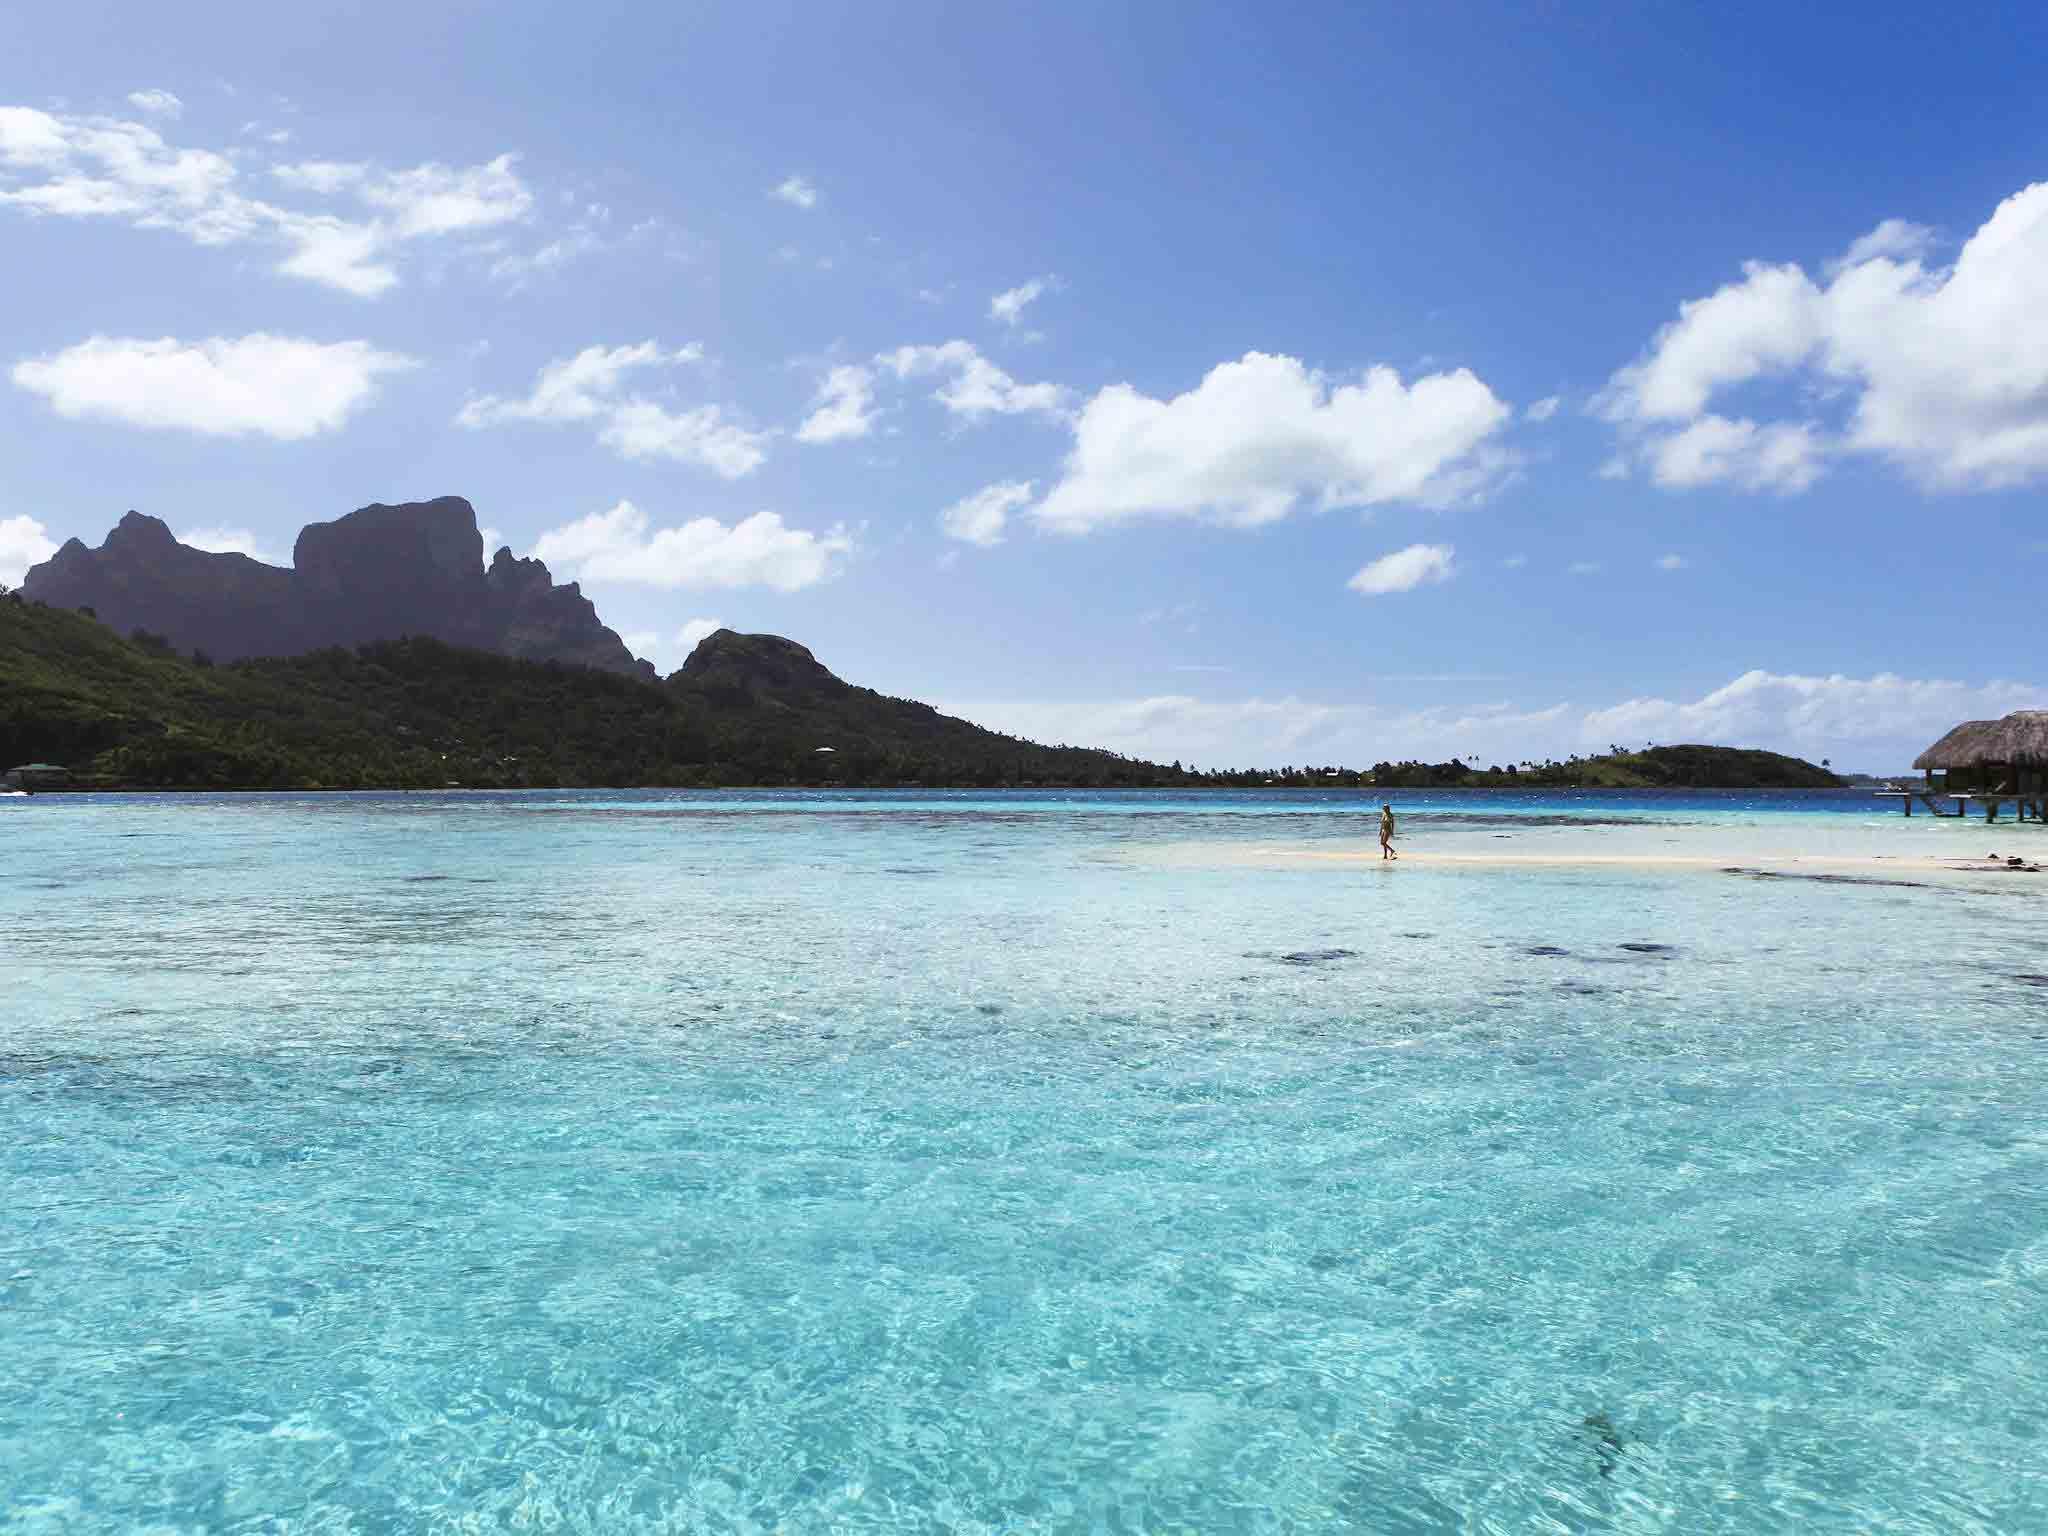 Sofitel Bora Bora Private Island Hotel - 5 Star | AccorHotels